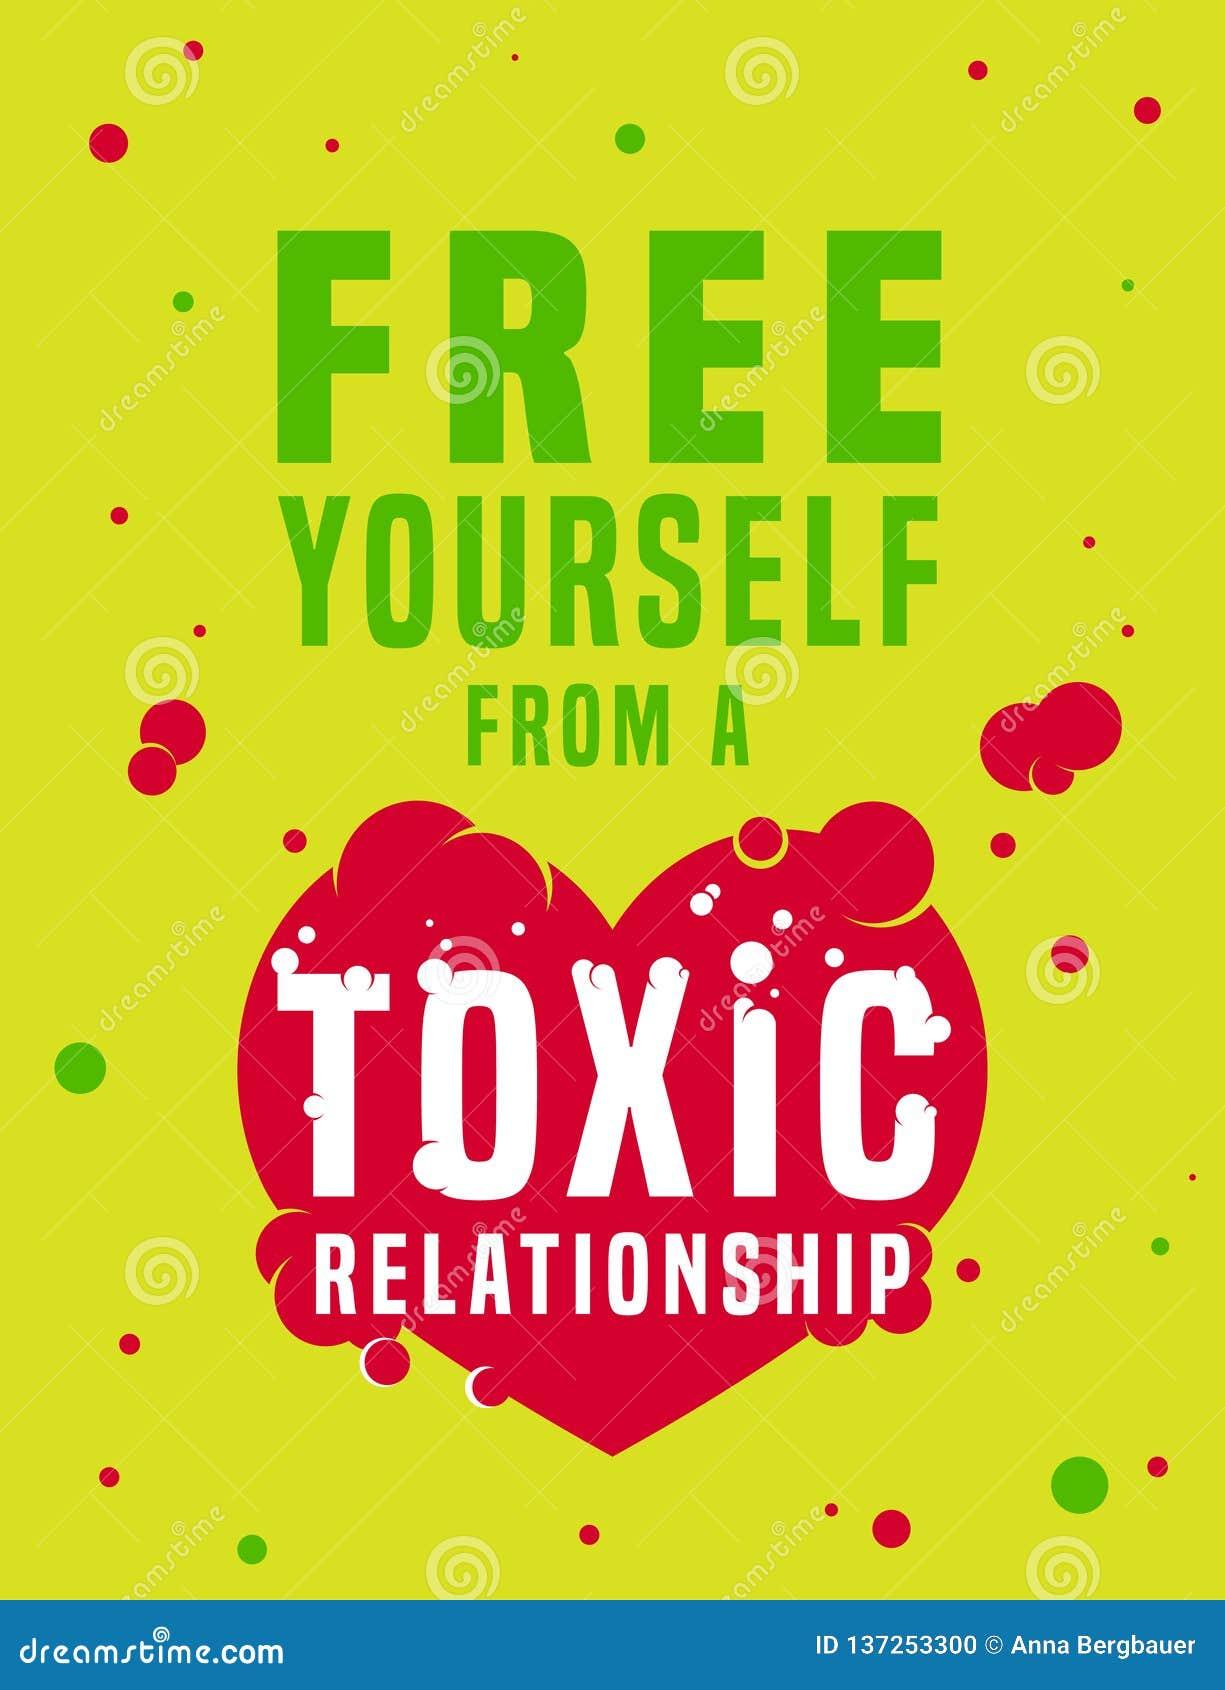 Immagine tossica di relazioni